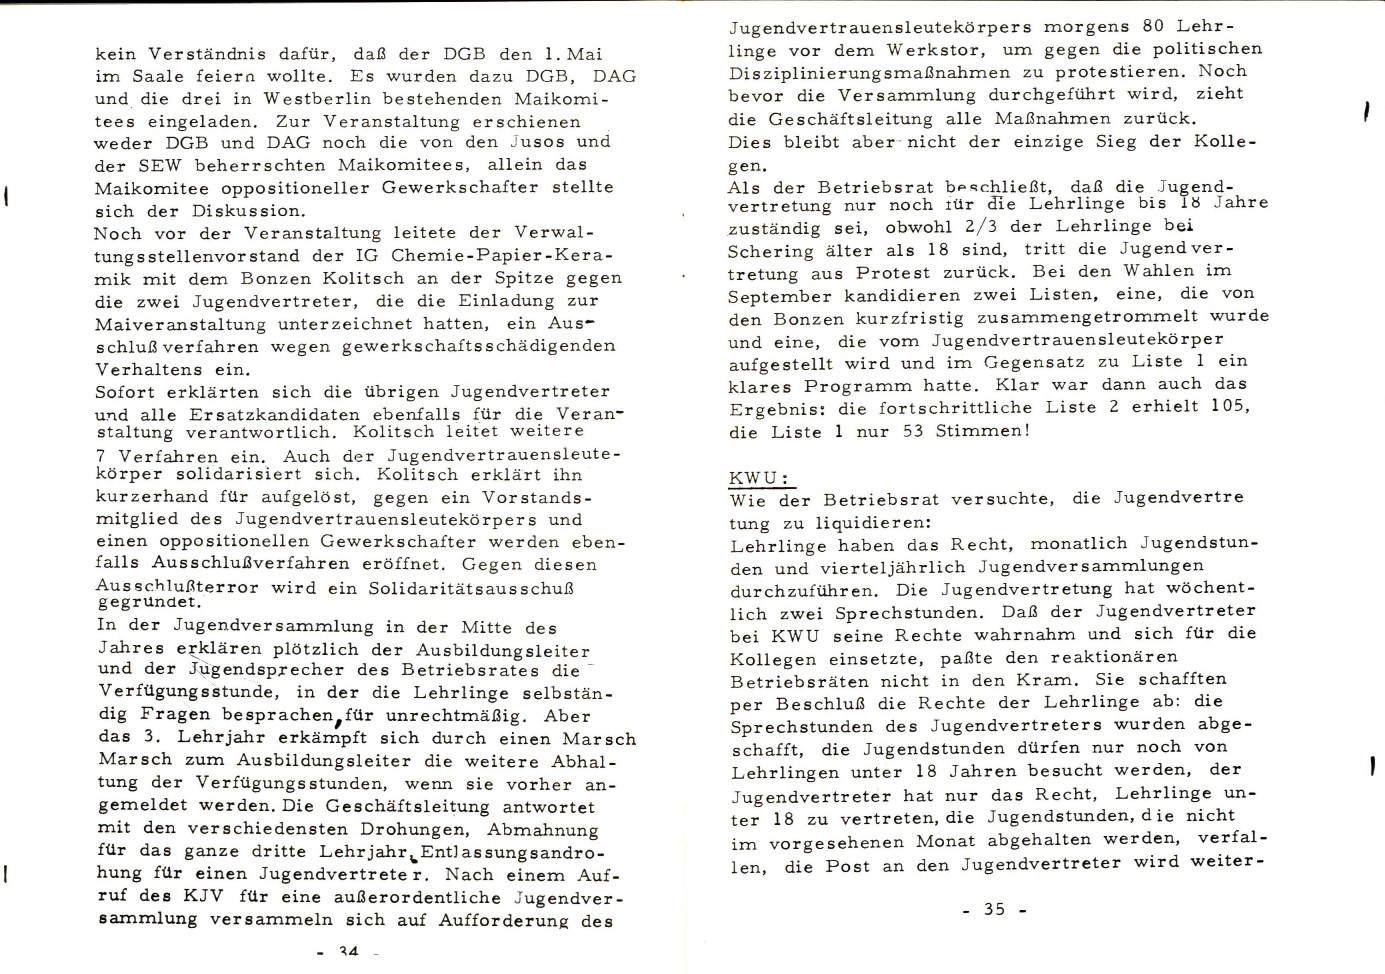 KJV_1973_NK_Arbeiterjugend_19